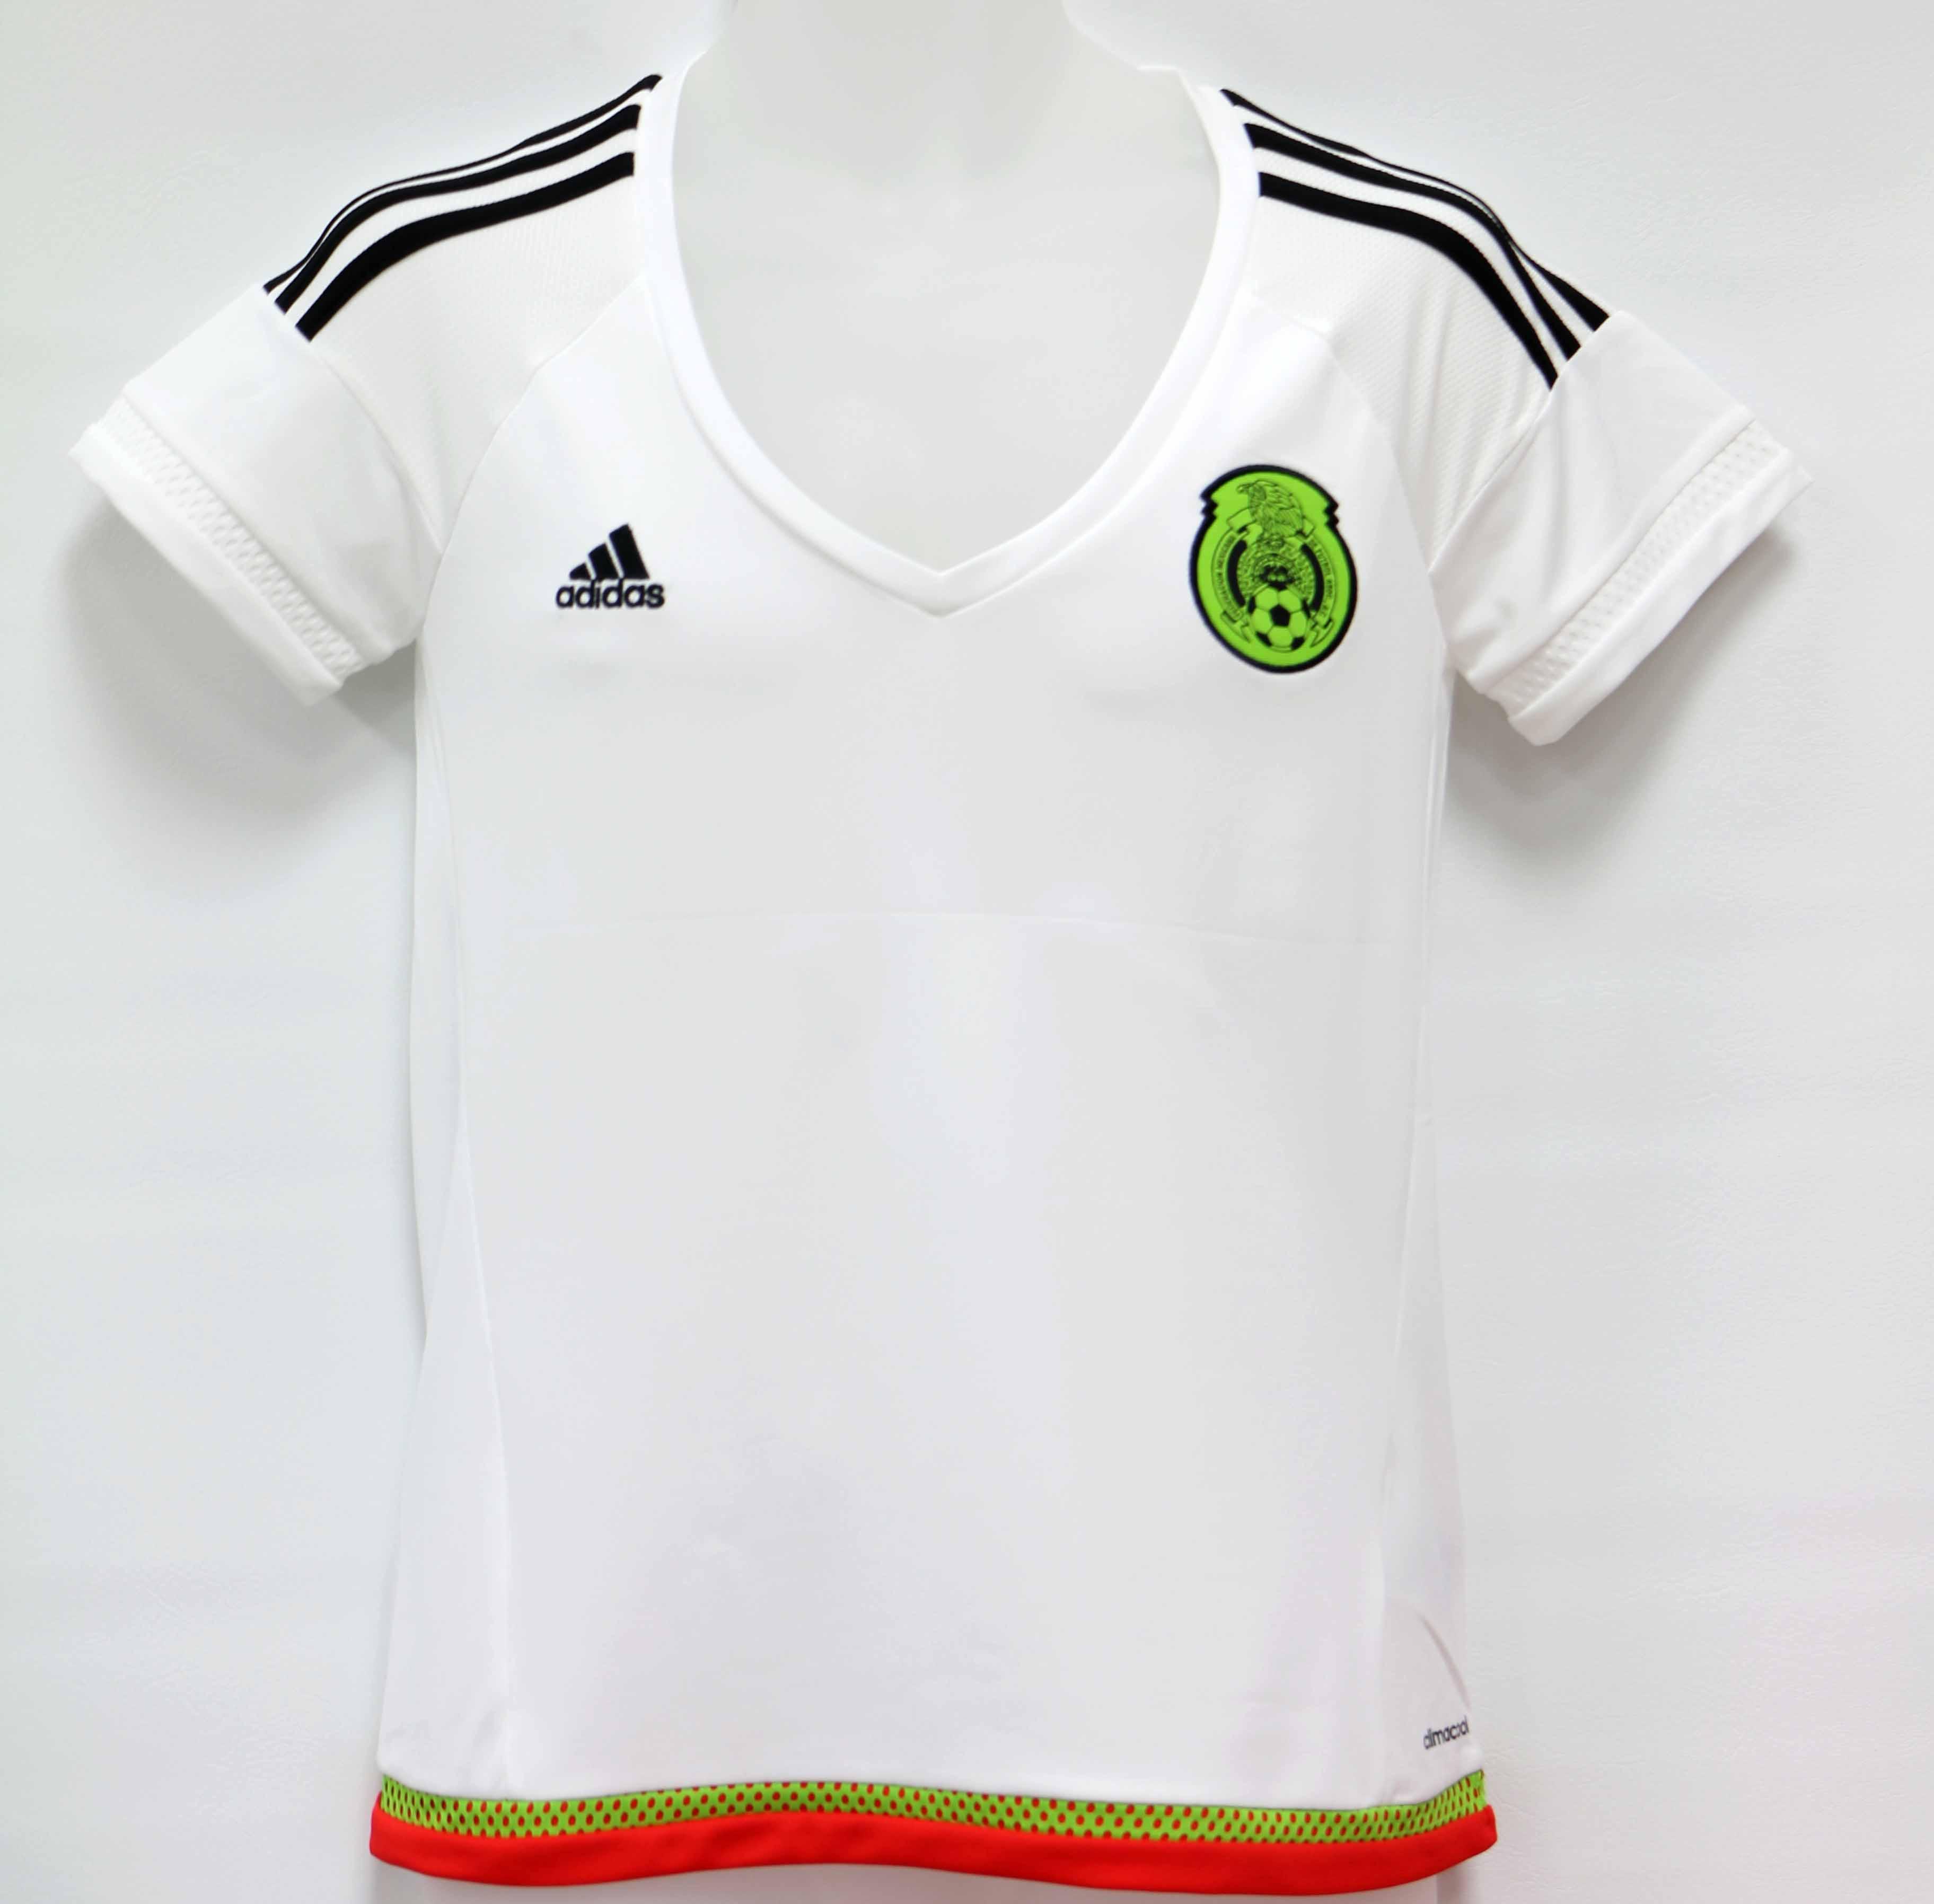 381f06b27ec adidas Mexico Women s Away Stadium Jersey 2015-16 - Soccer Premier